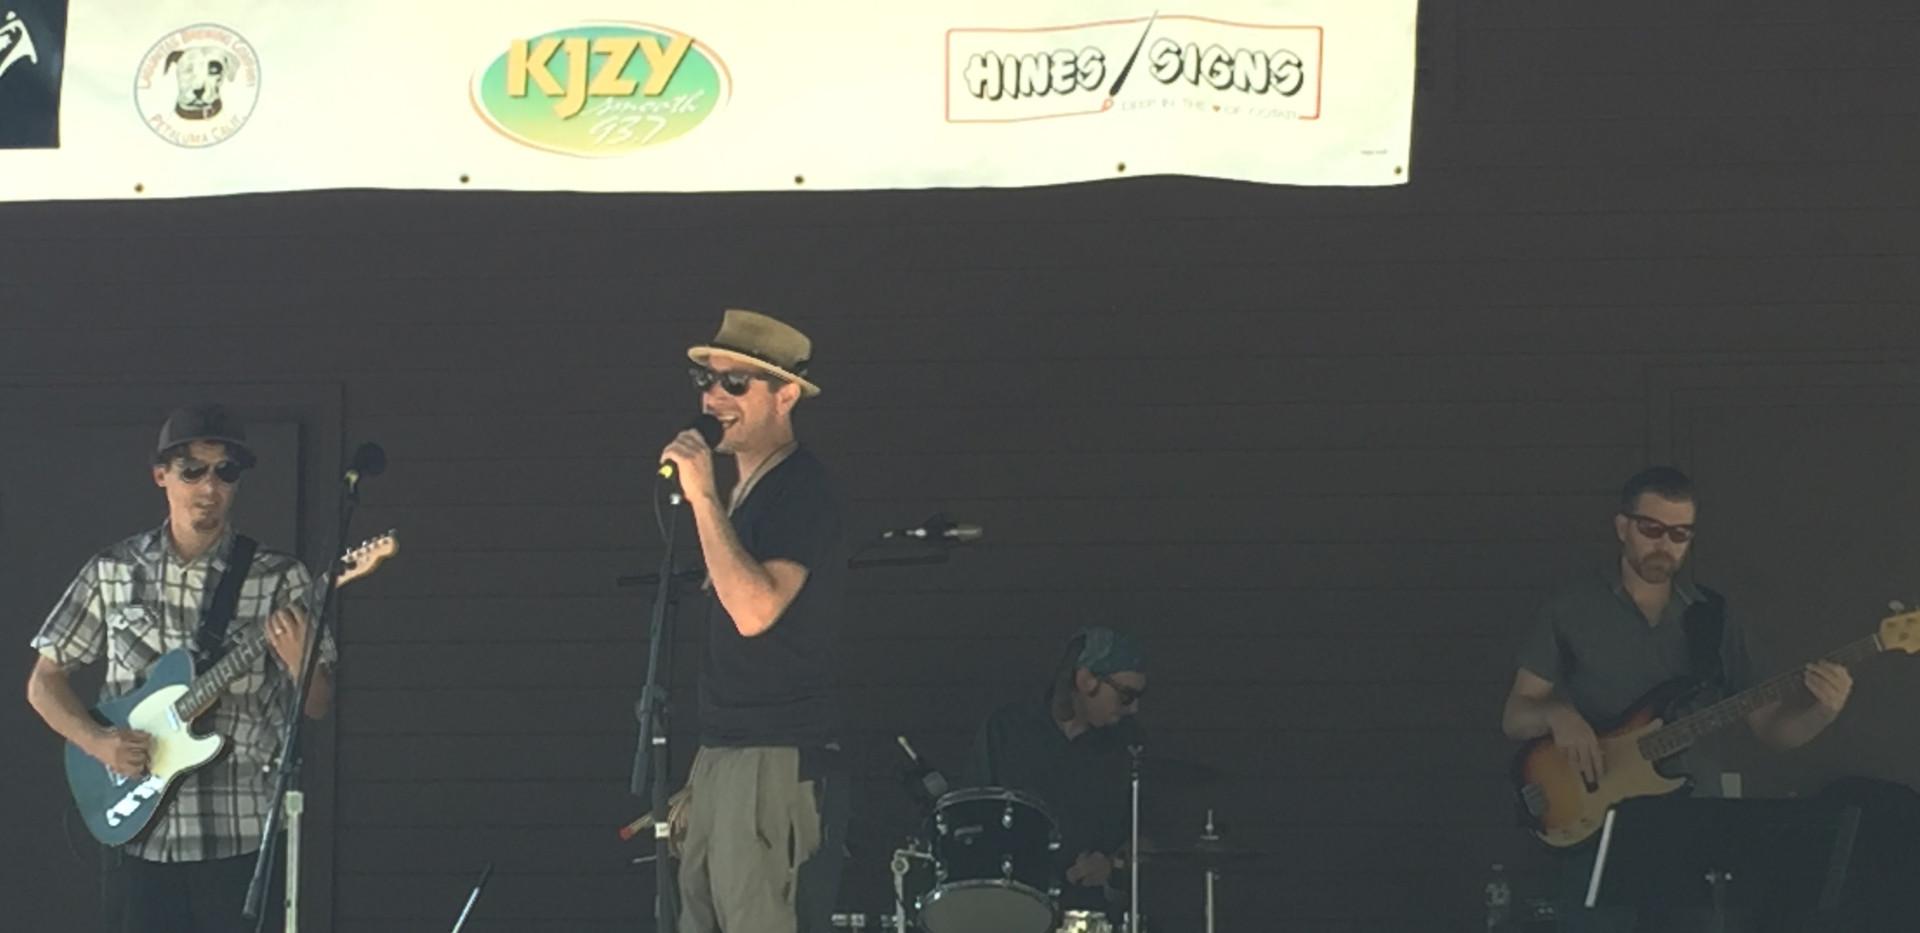 RS at Cotati Jazz Festival